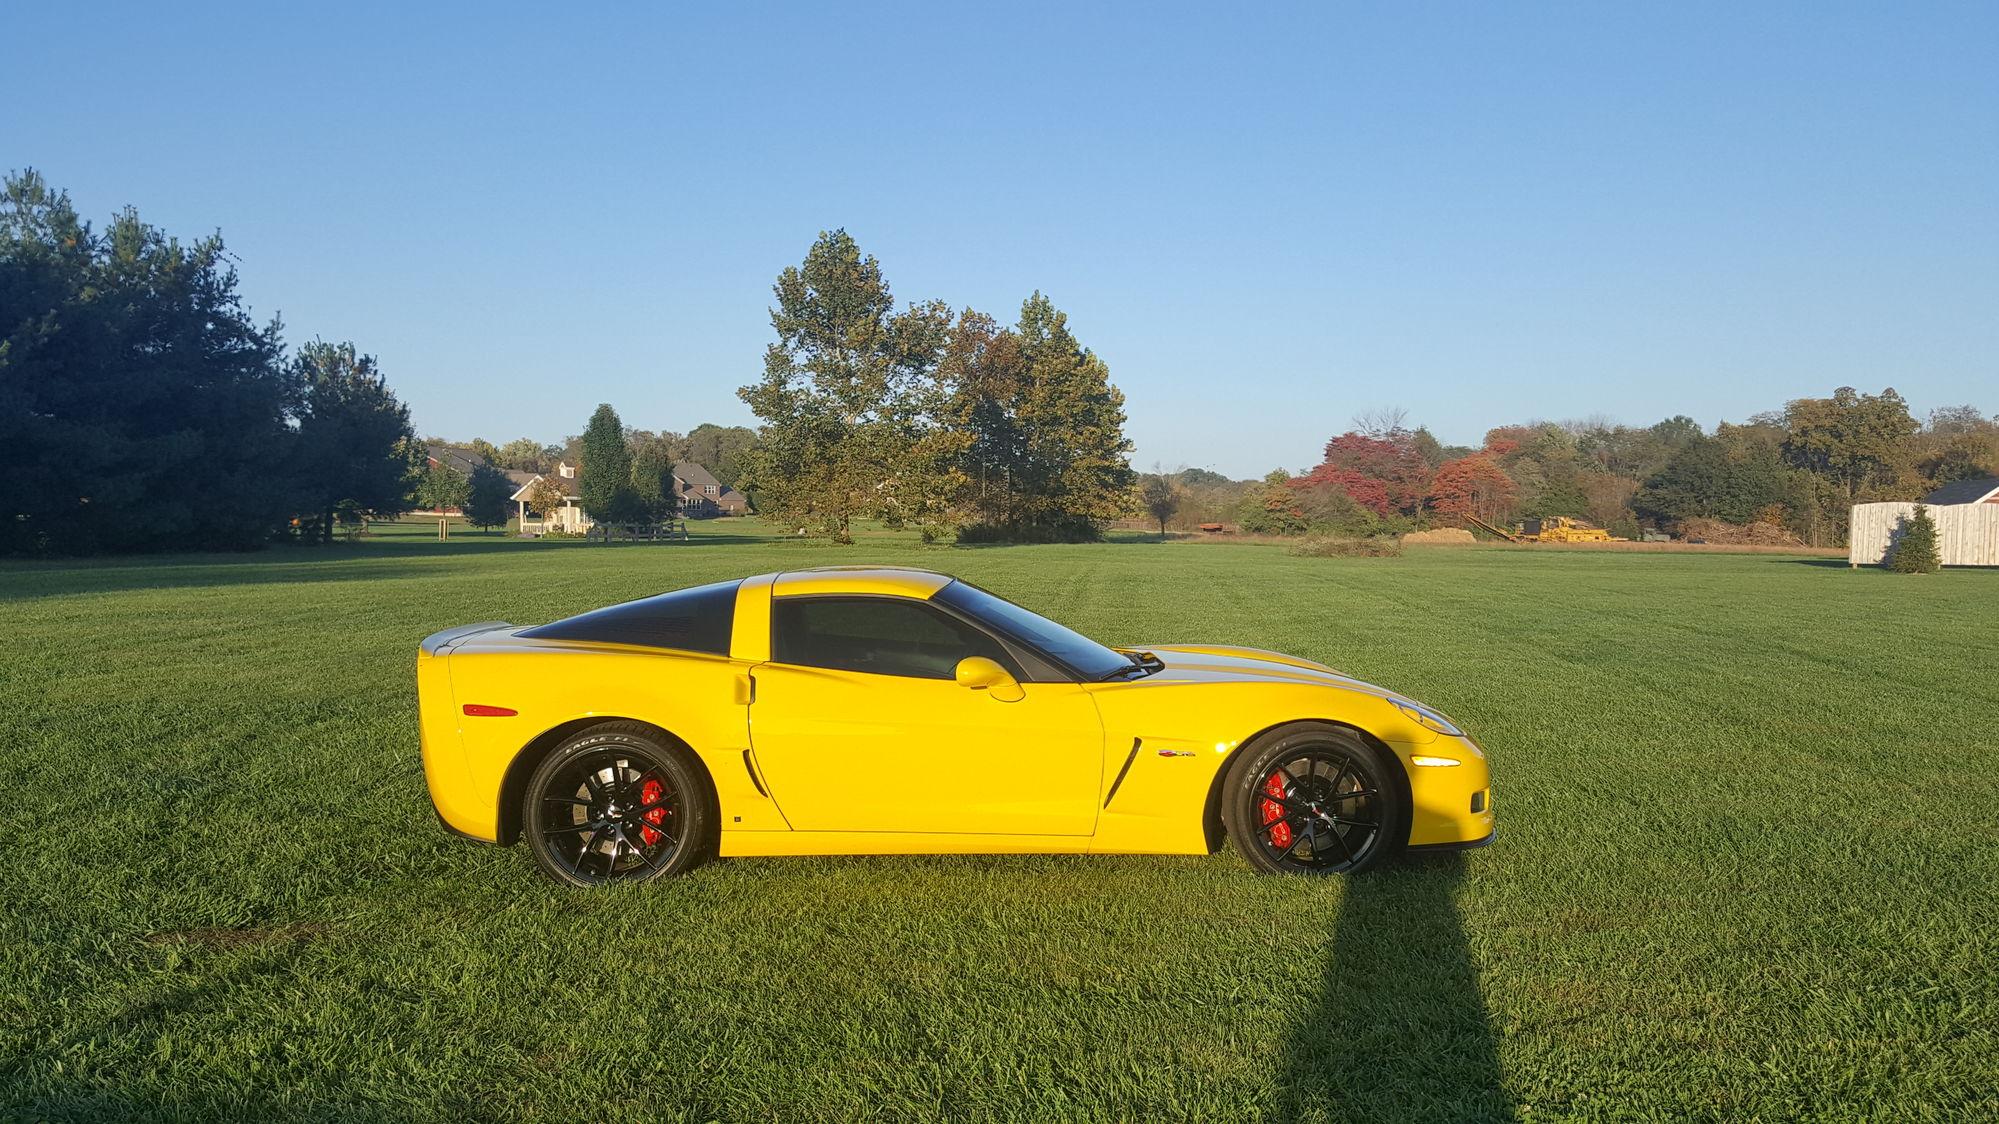 09 Z06 Corvetteforum Chevrolet Corvette Forum Discussion